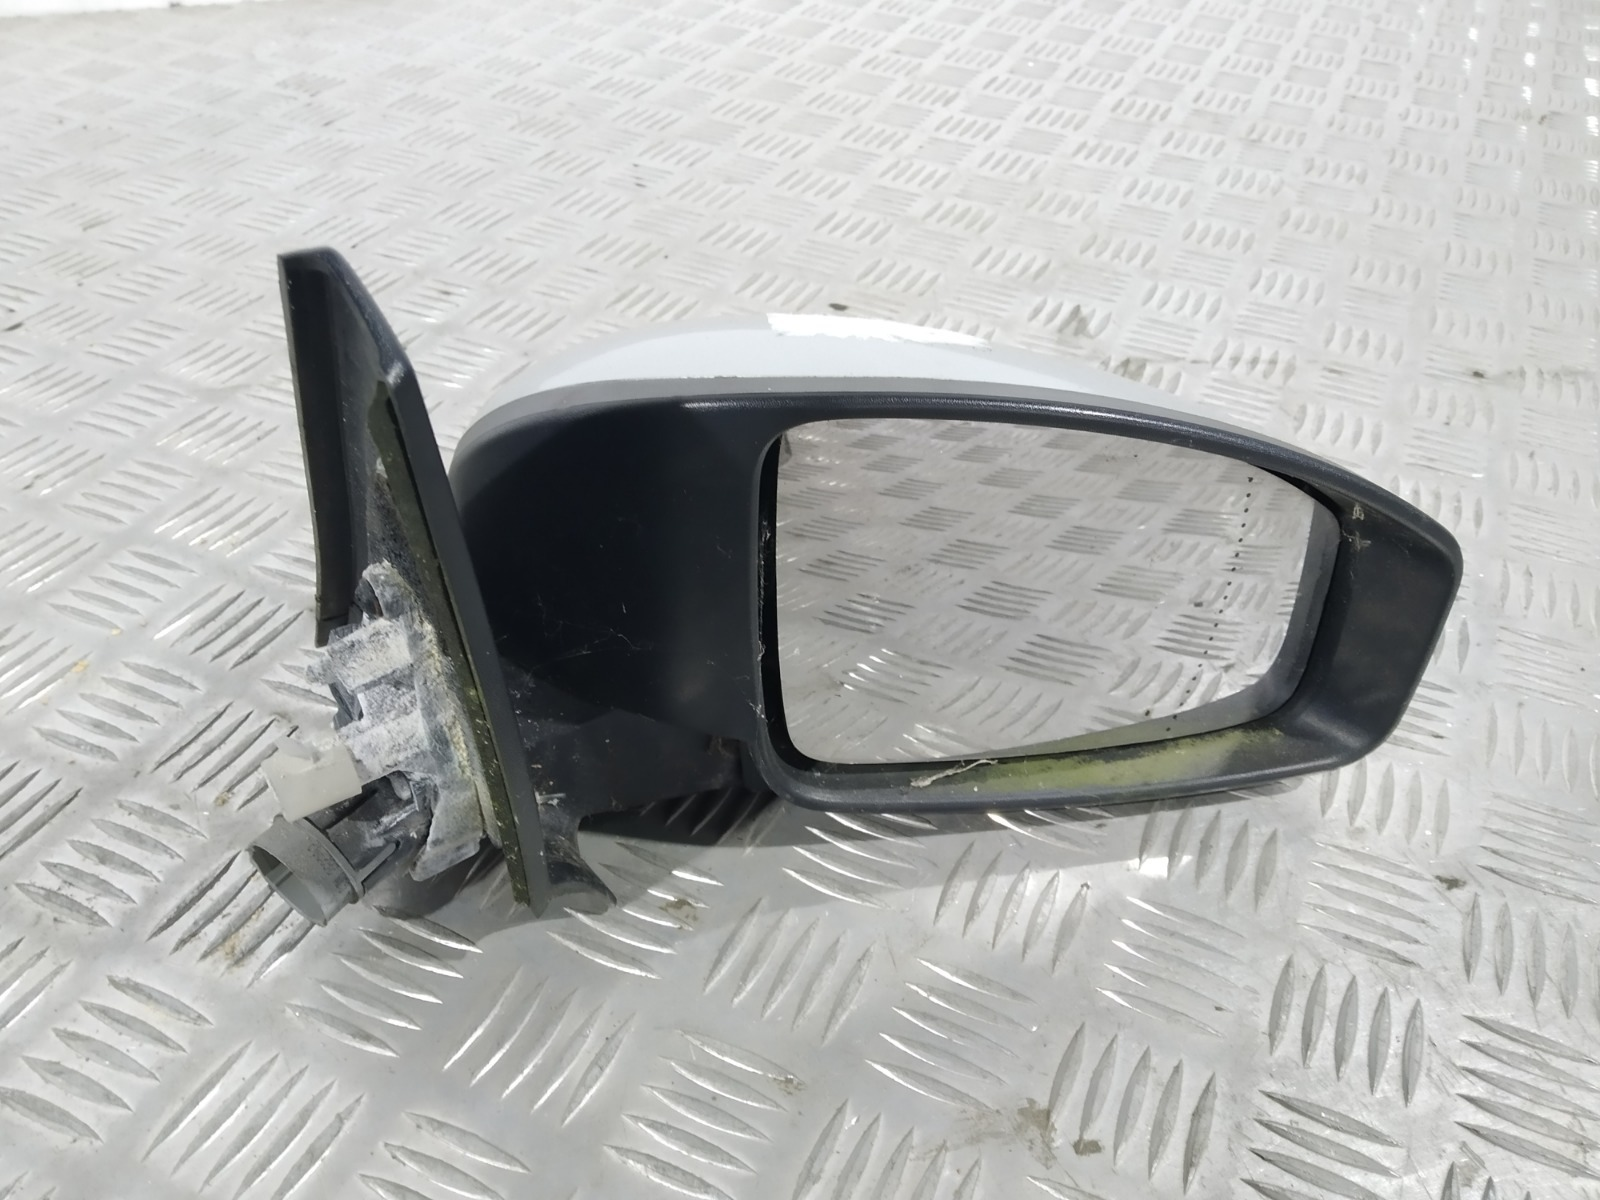 Зеркало наружное правое Renault Espace 1.9 DCI 2004 (б/у)